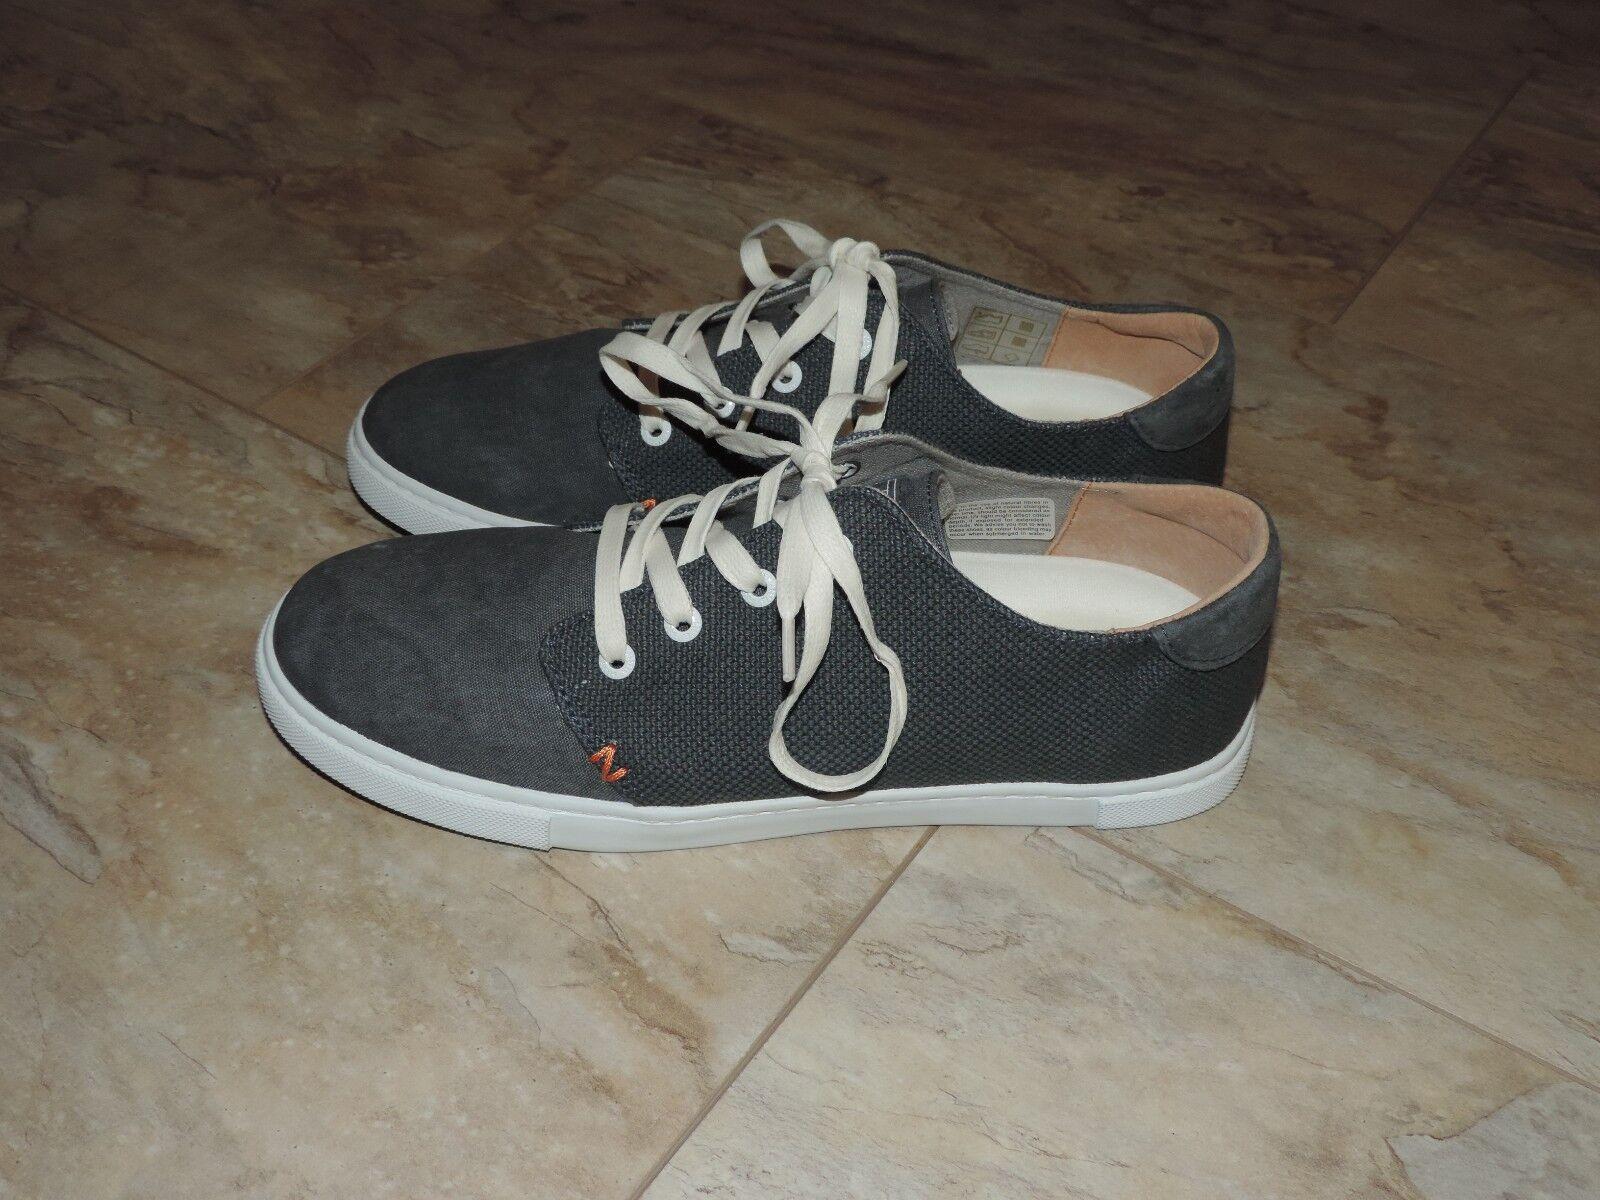 HUB CHUCKER Schuhe CHUCKER HUB C06 Canvas Sneakers, neu 8a02ed